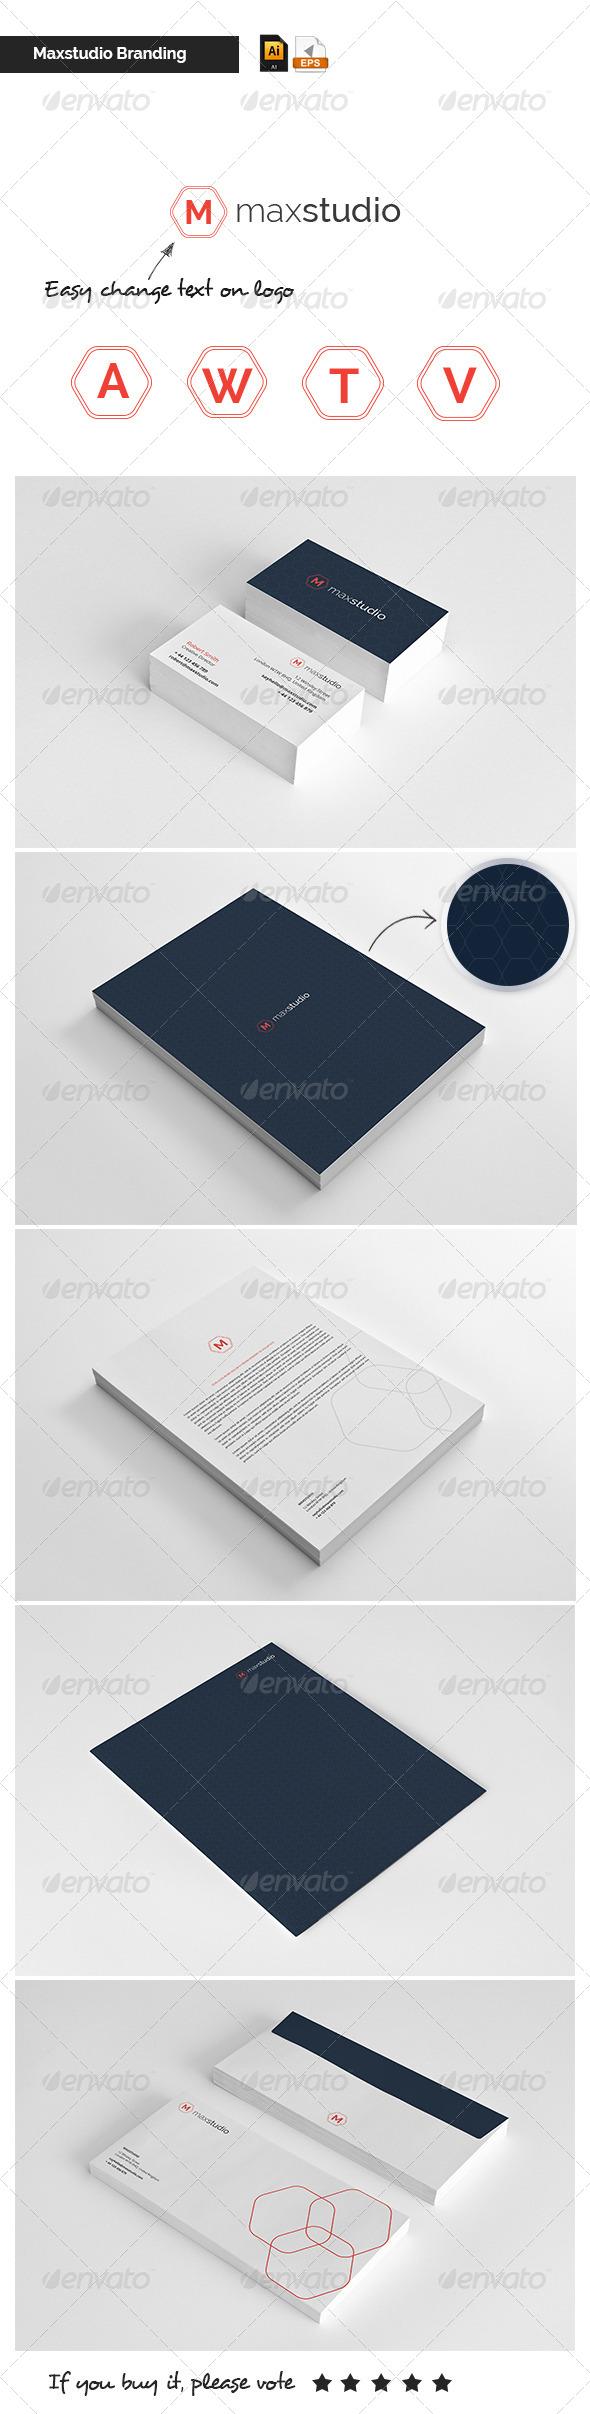 Stationary & Brand Identity - Maxstudio - Stationery Print Templates